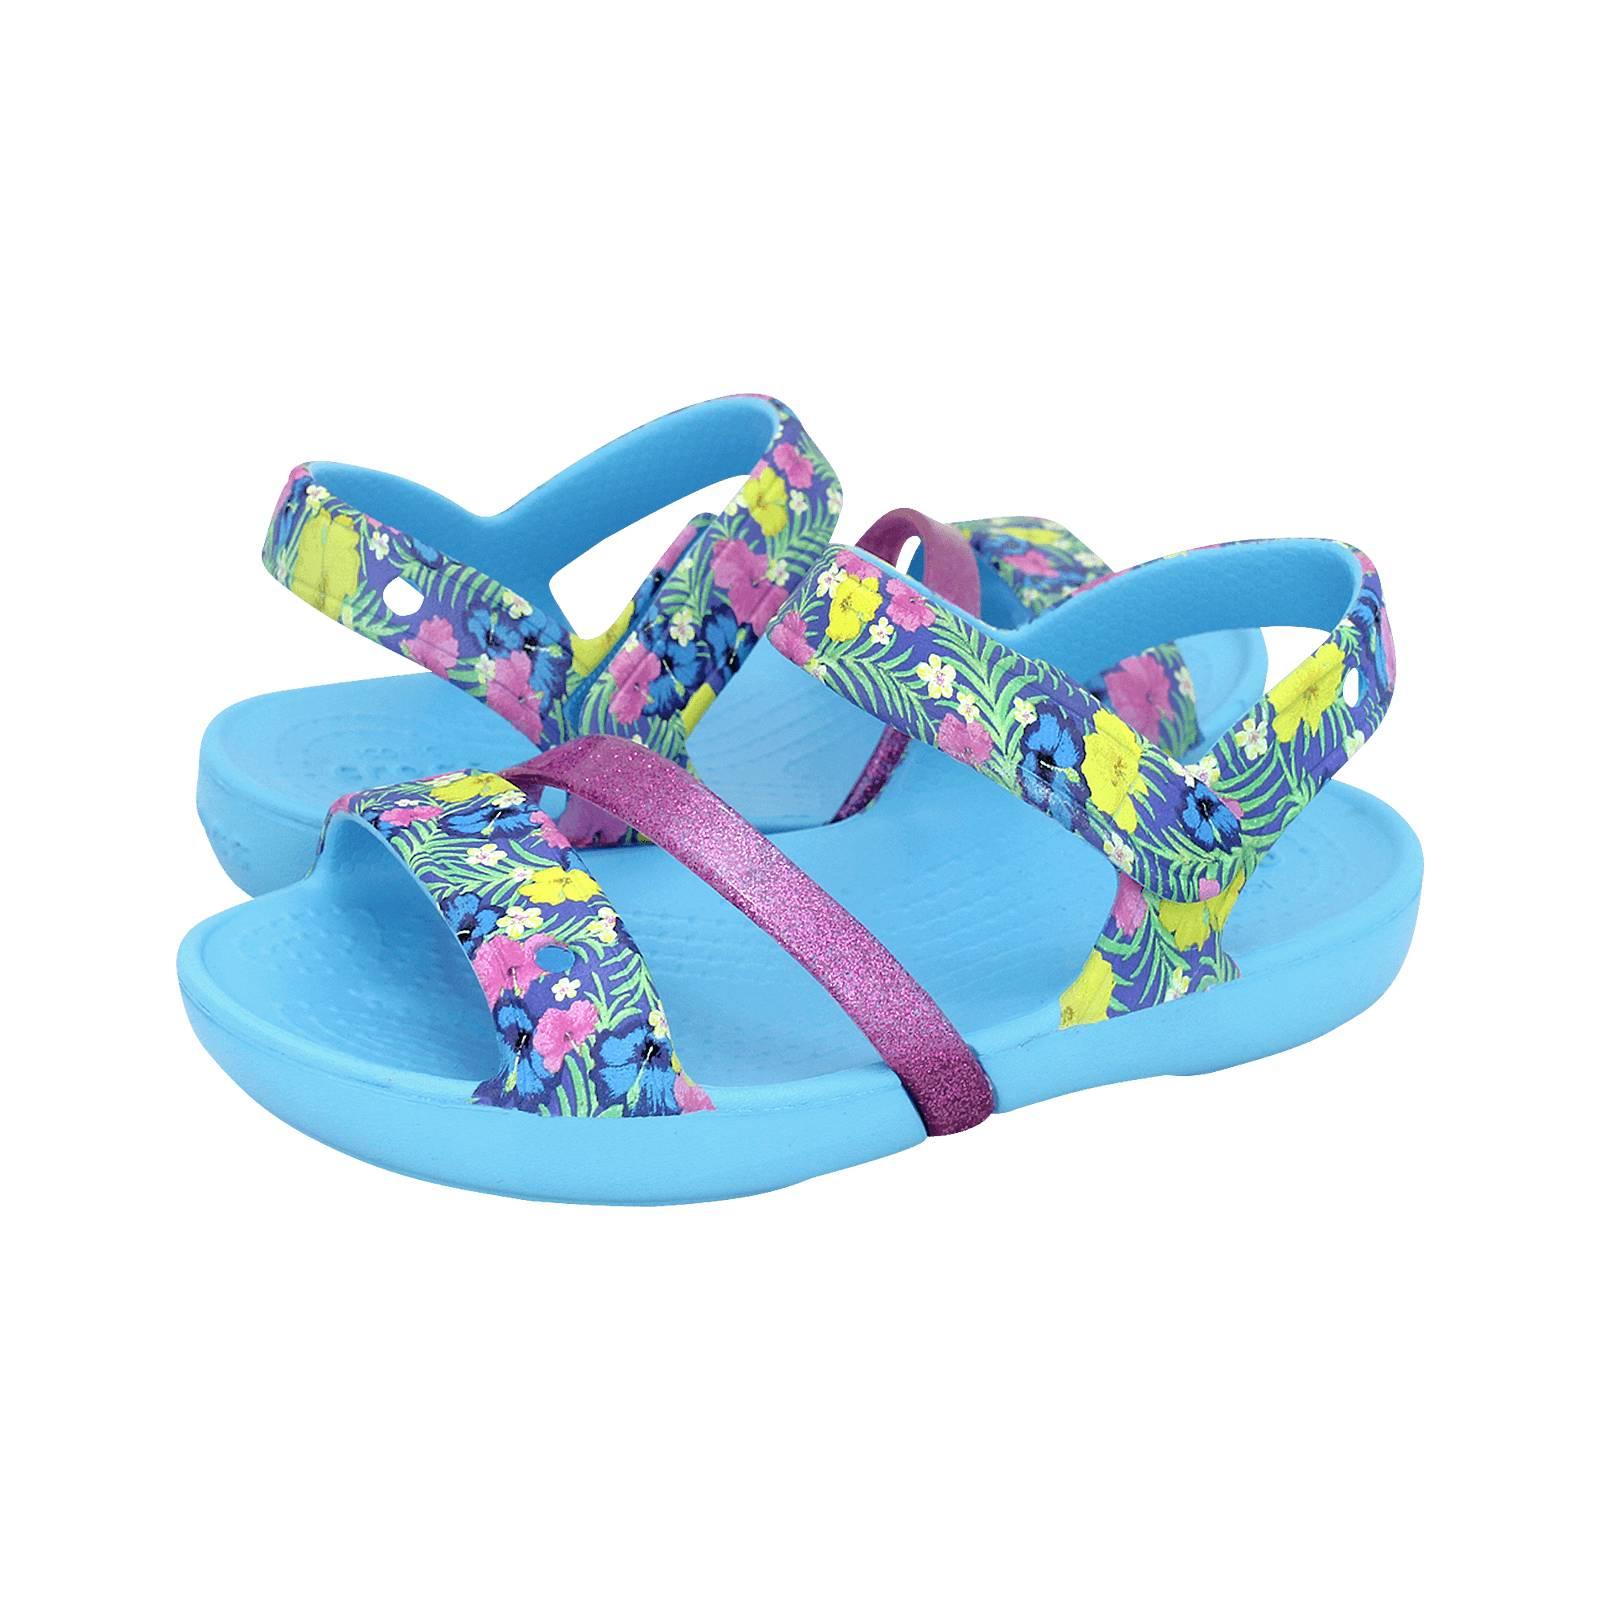 7c196265fd6e7 Crocs Lina Sandal S - Crocs Kids  sandals made of croslite - Gianna ...